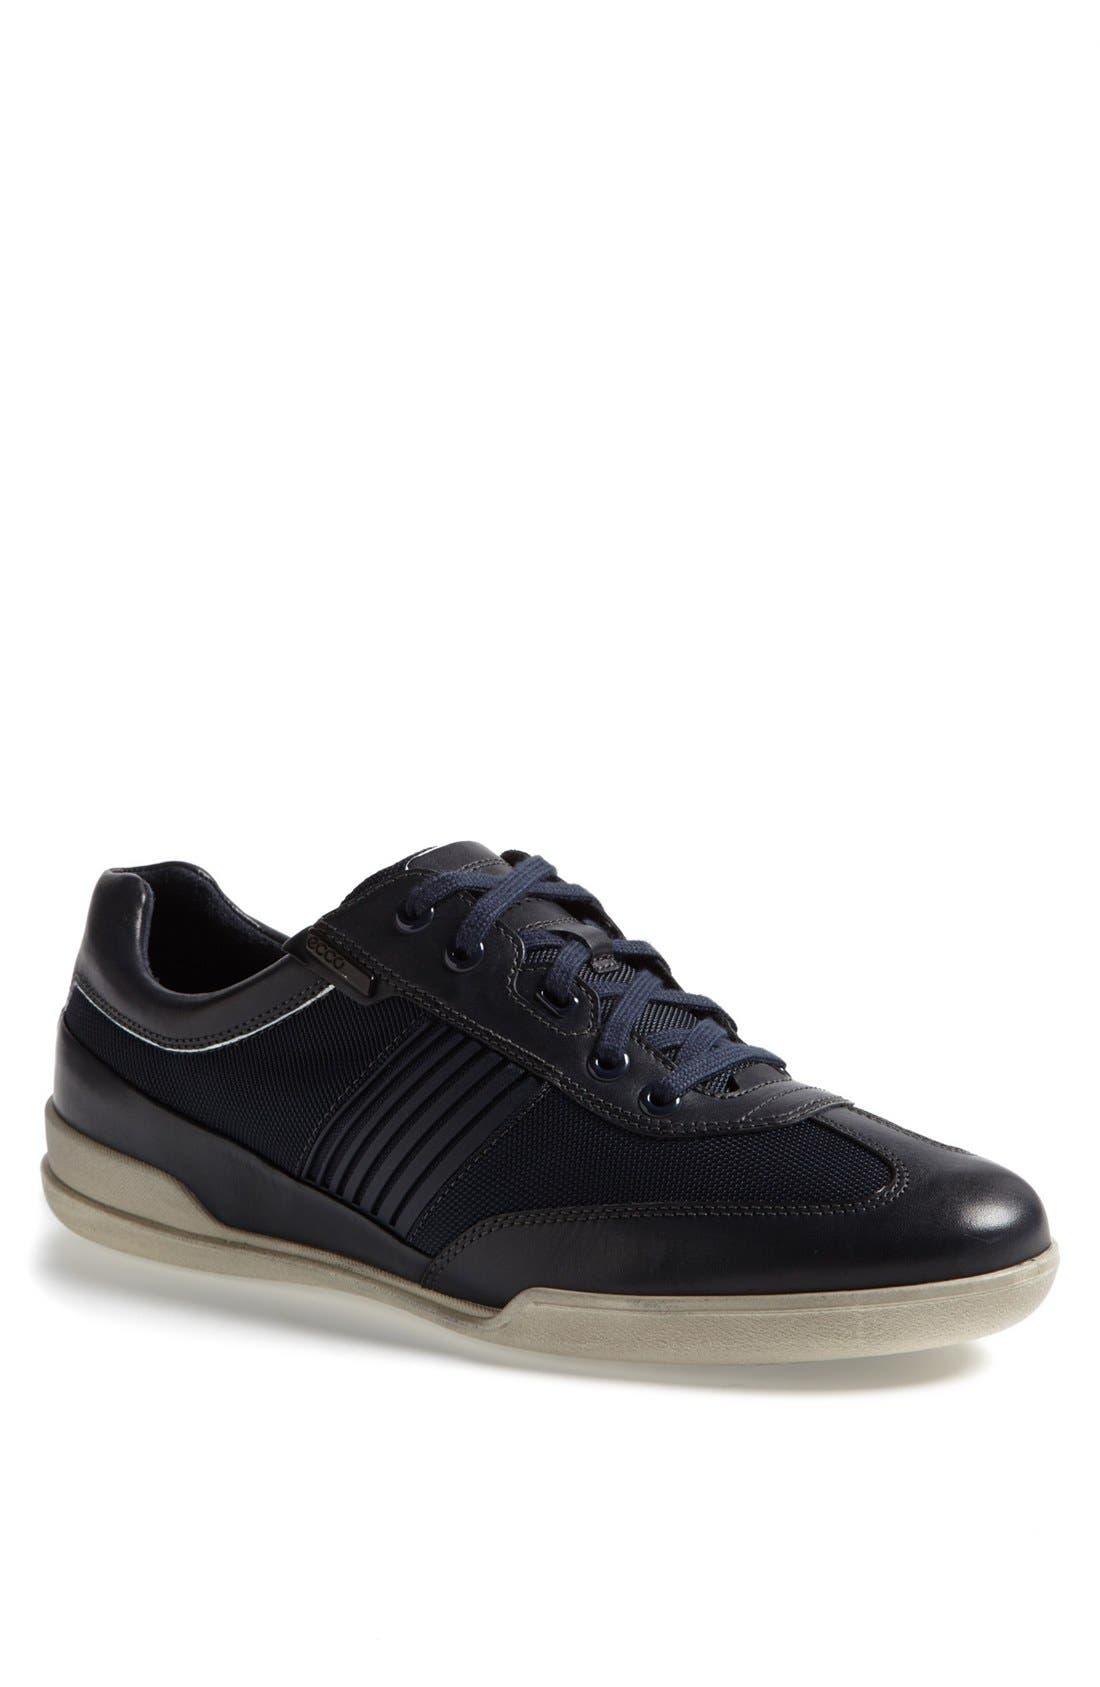 Main Image - ECCO 'Enrico' Sneaker